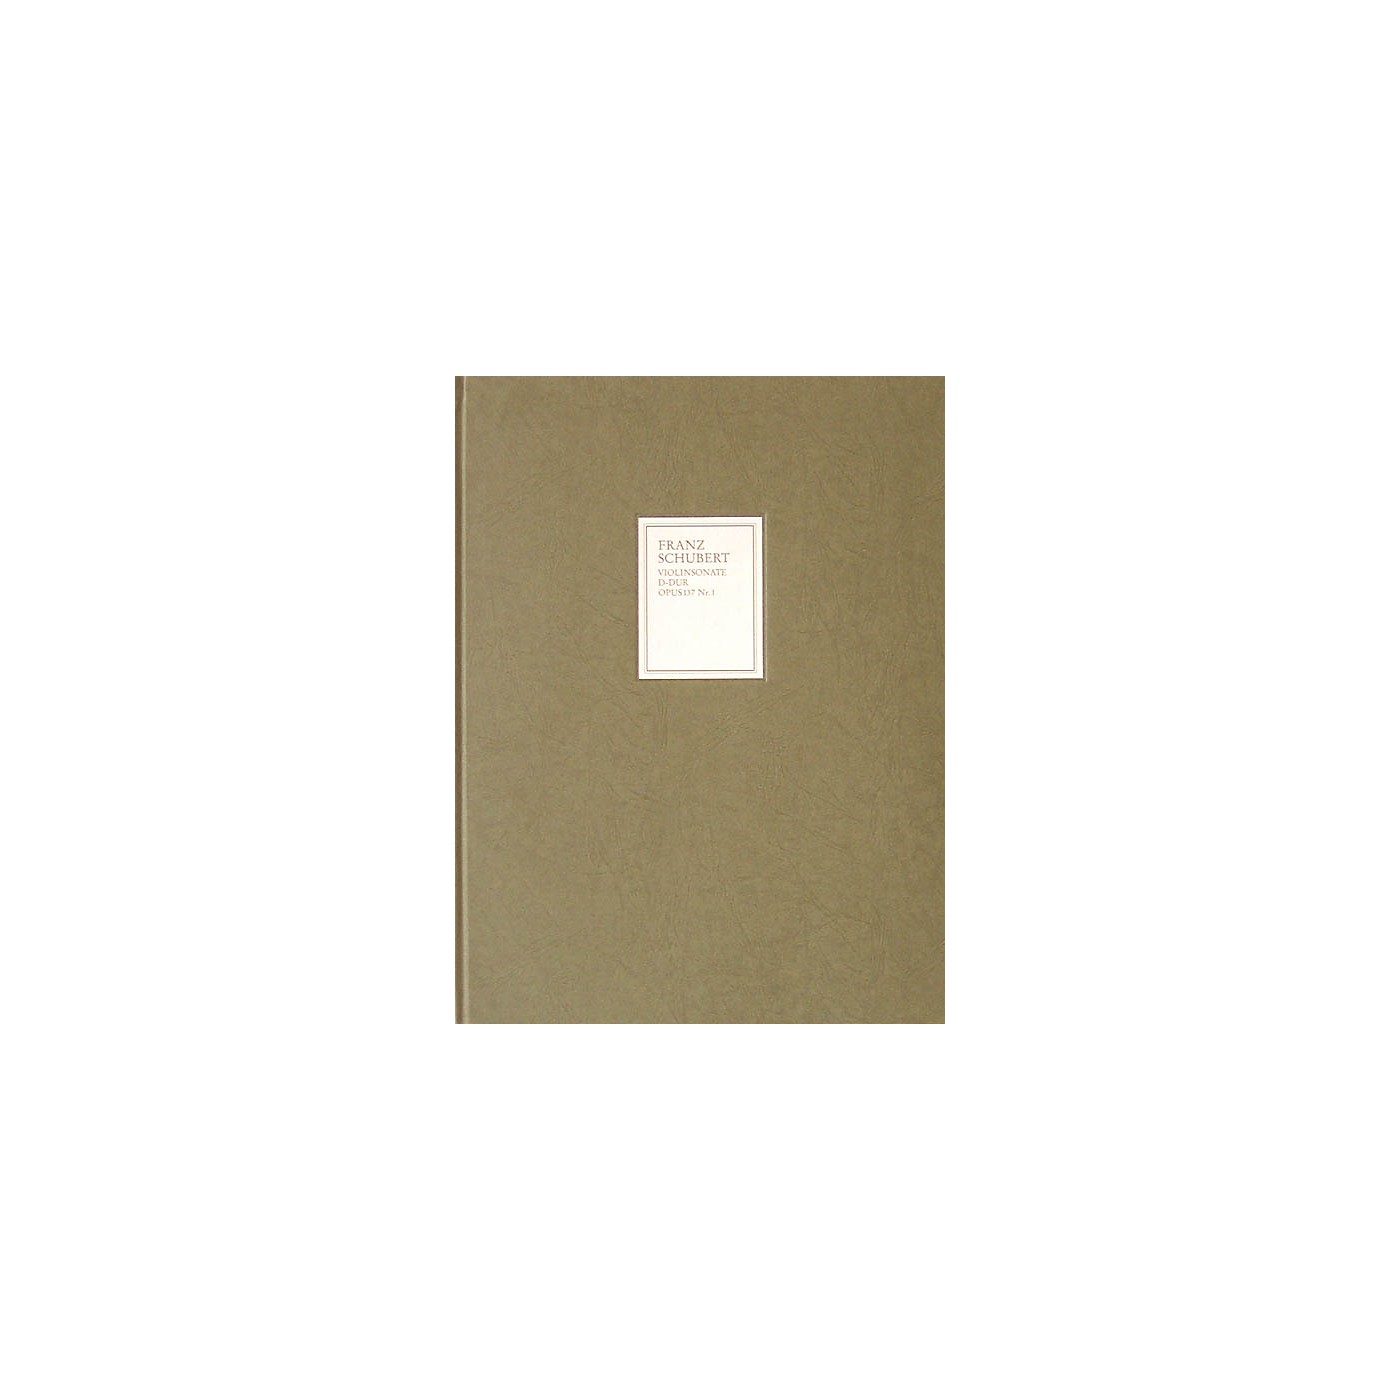 G. Henle Verlag Sonata (Sonatina) for Piano and Violin in D Major Op. 137, No. 1 D384 Henle Facsimile Series Hardcover thumbnail